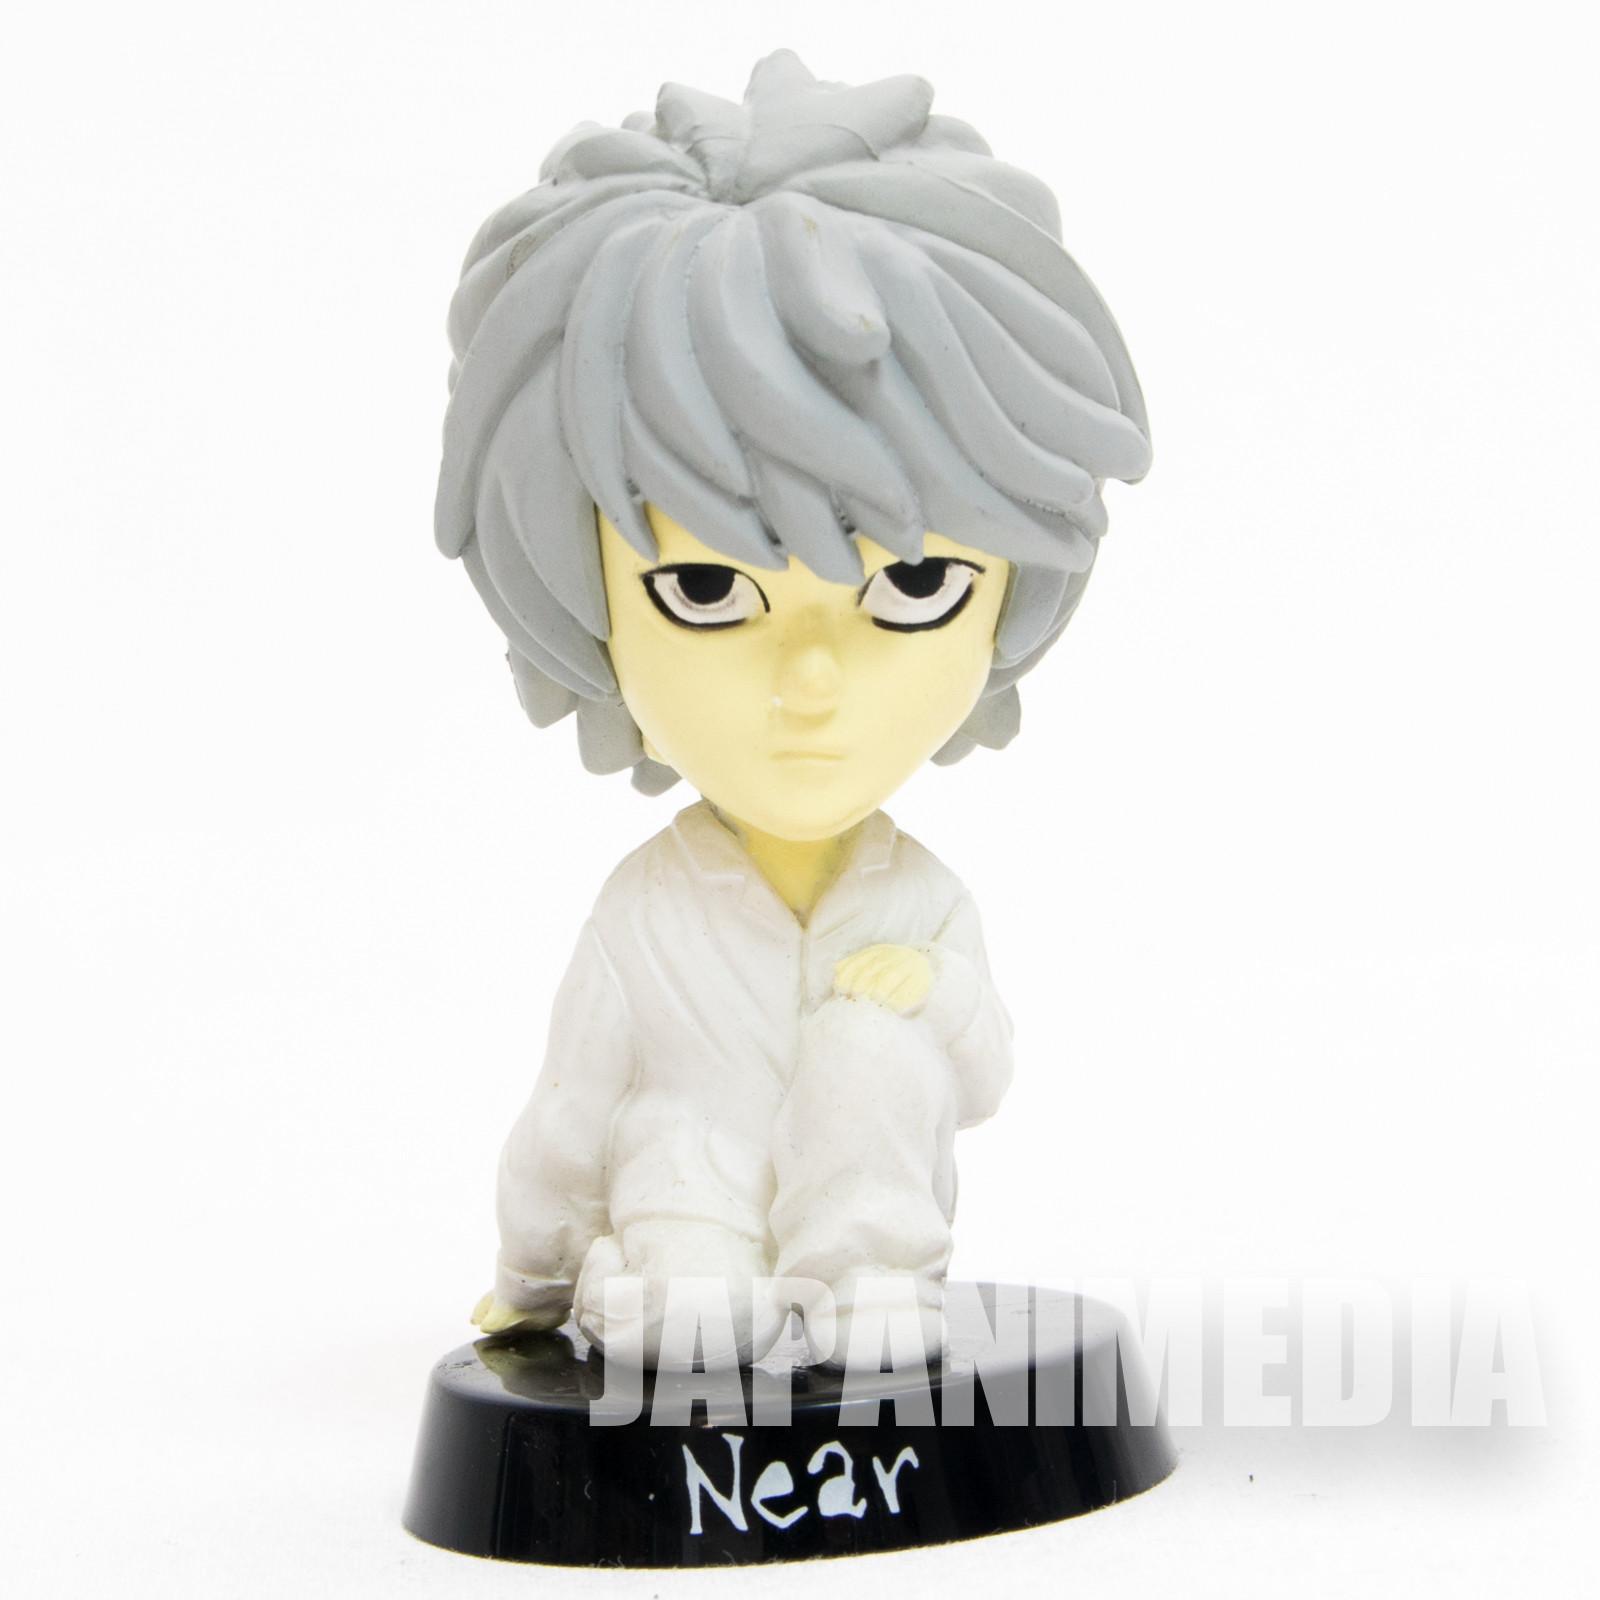 Death Note Near Bobble Bobbin Head Figure JAPAN ANIME MANGA